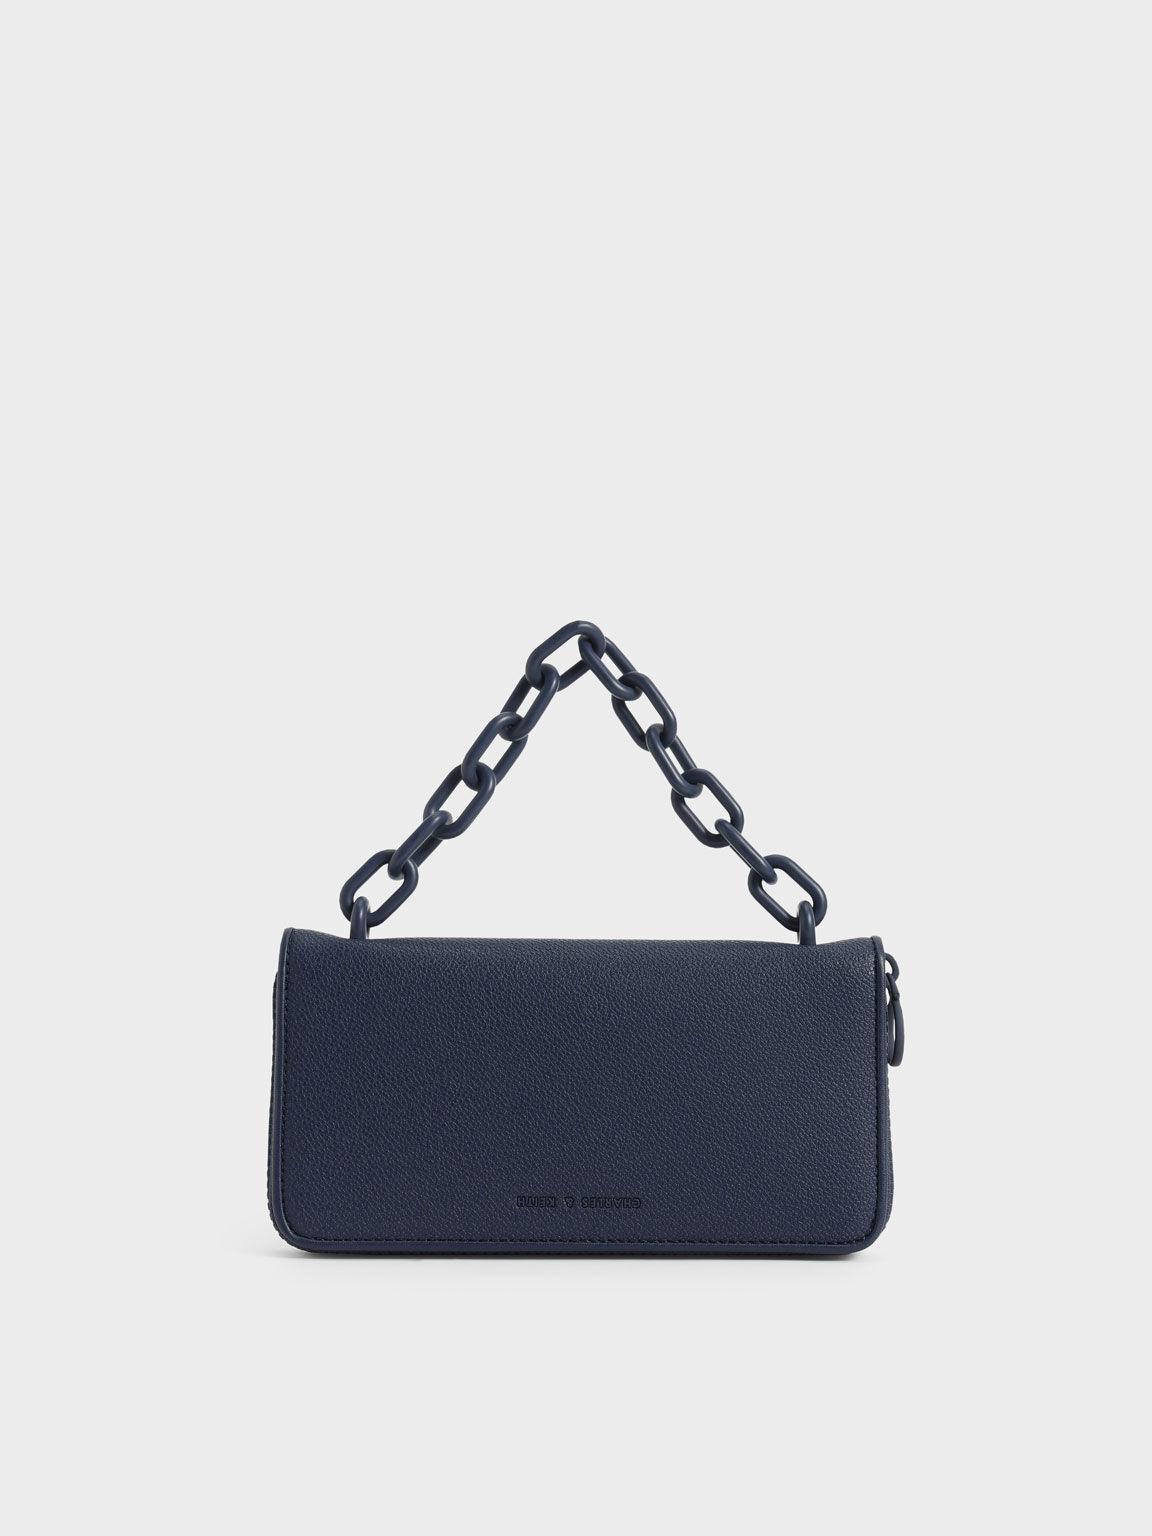 Chain Link Long Wallet, Navy, hi-res